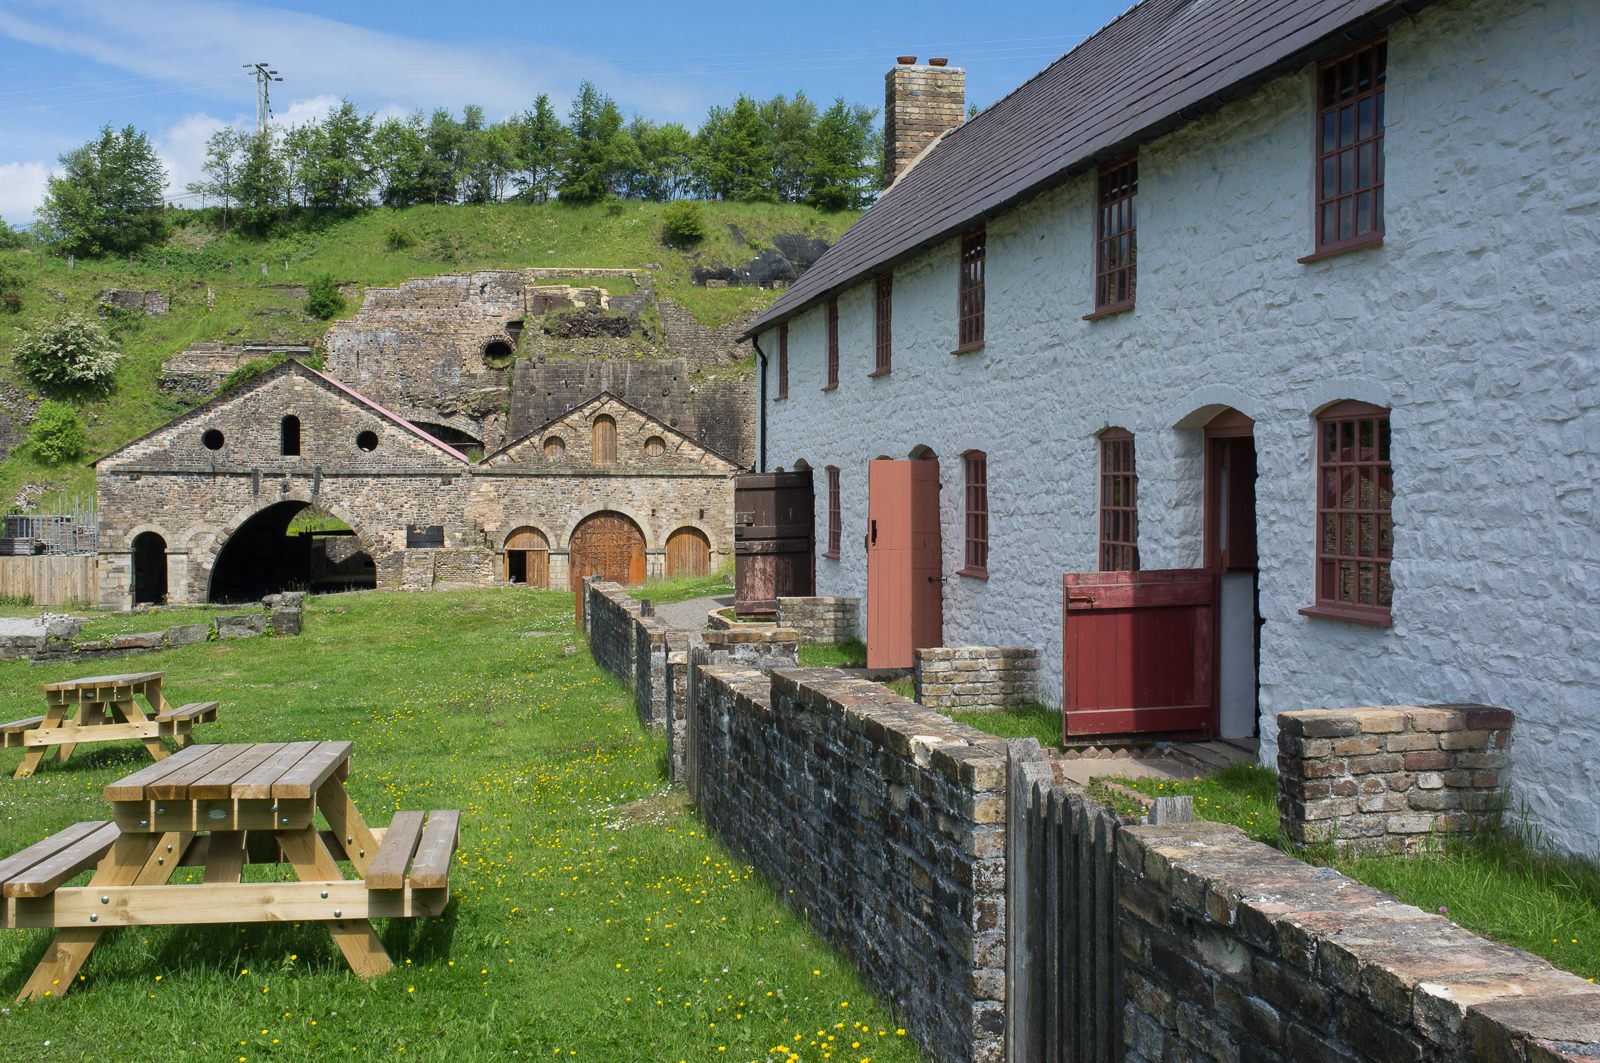 Company housing (Engine Row), Blaenavon - Wales